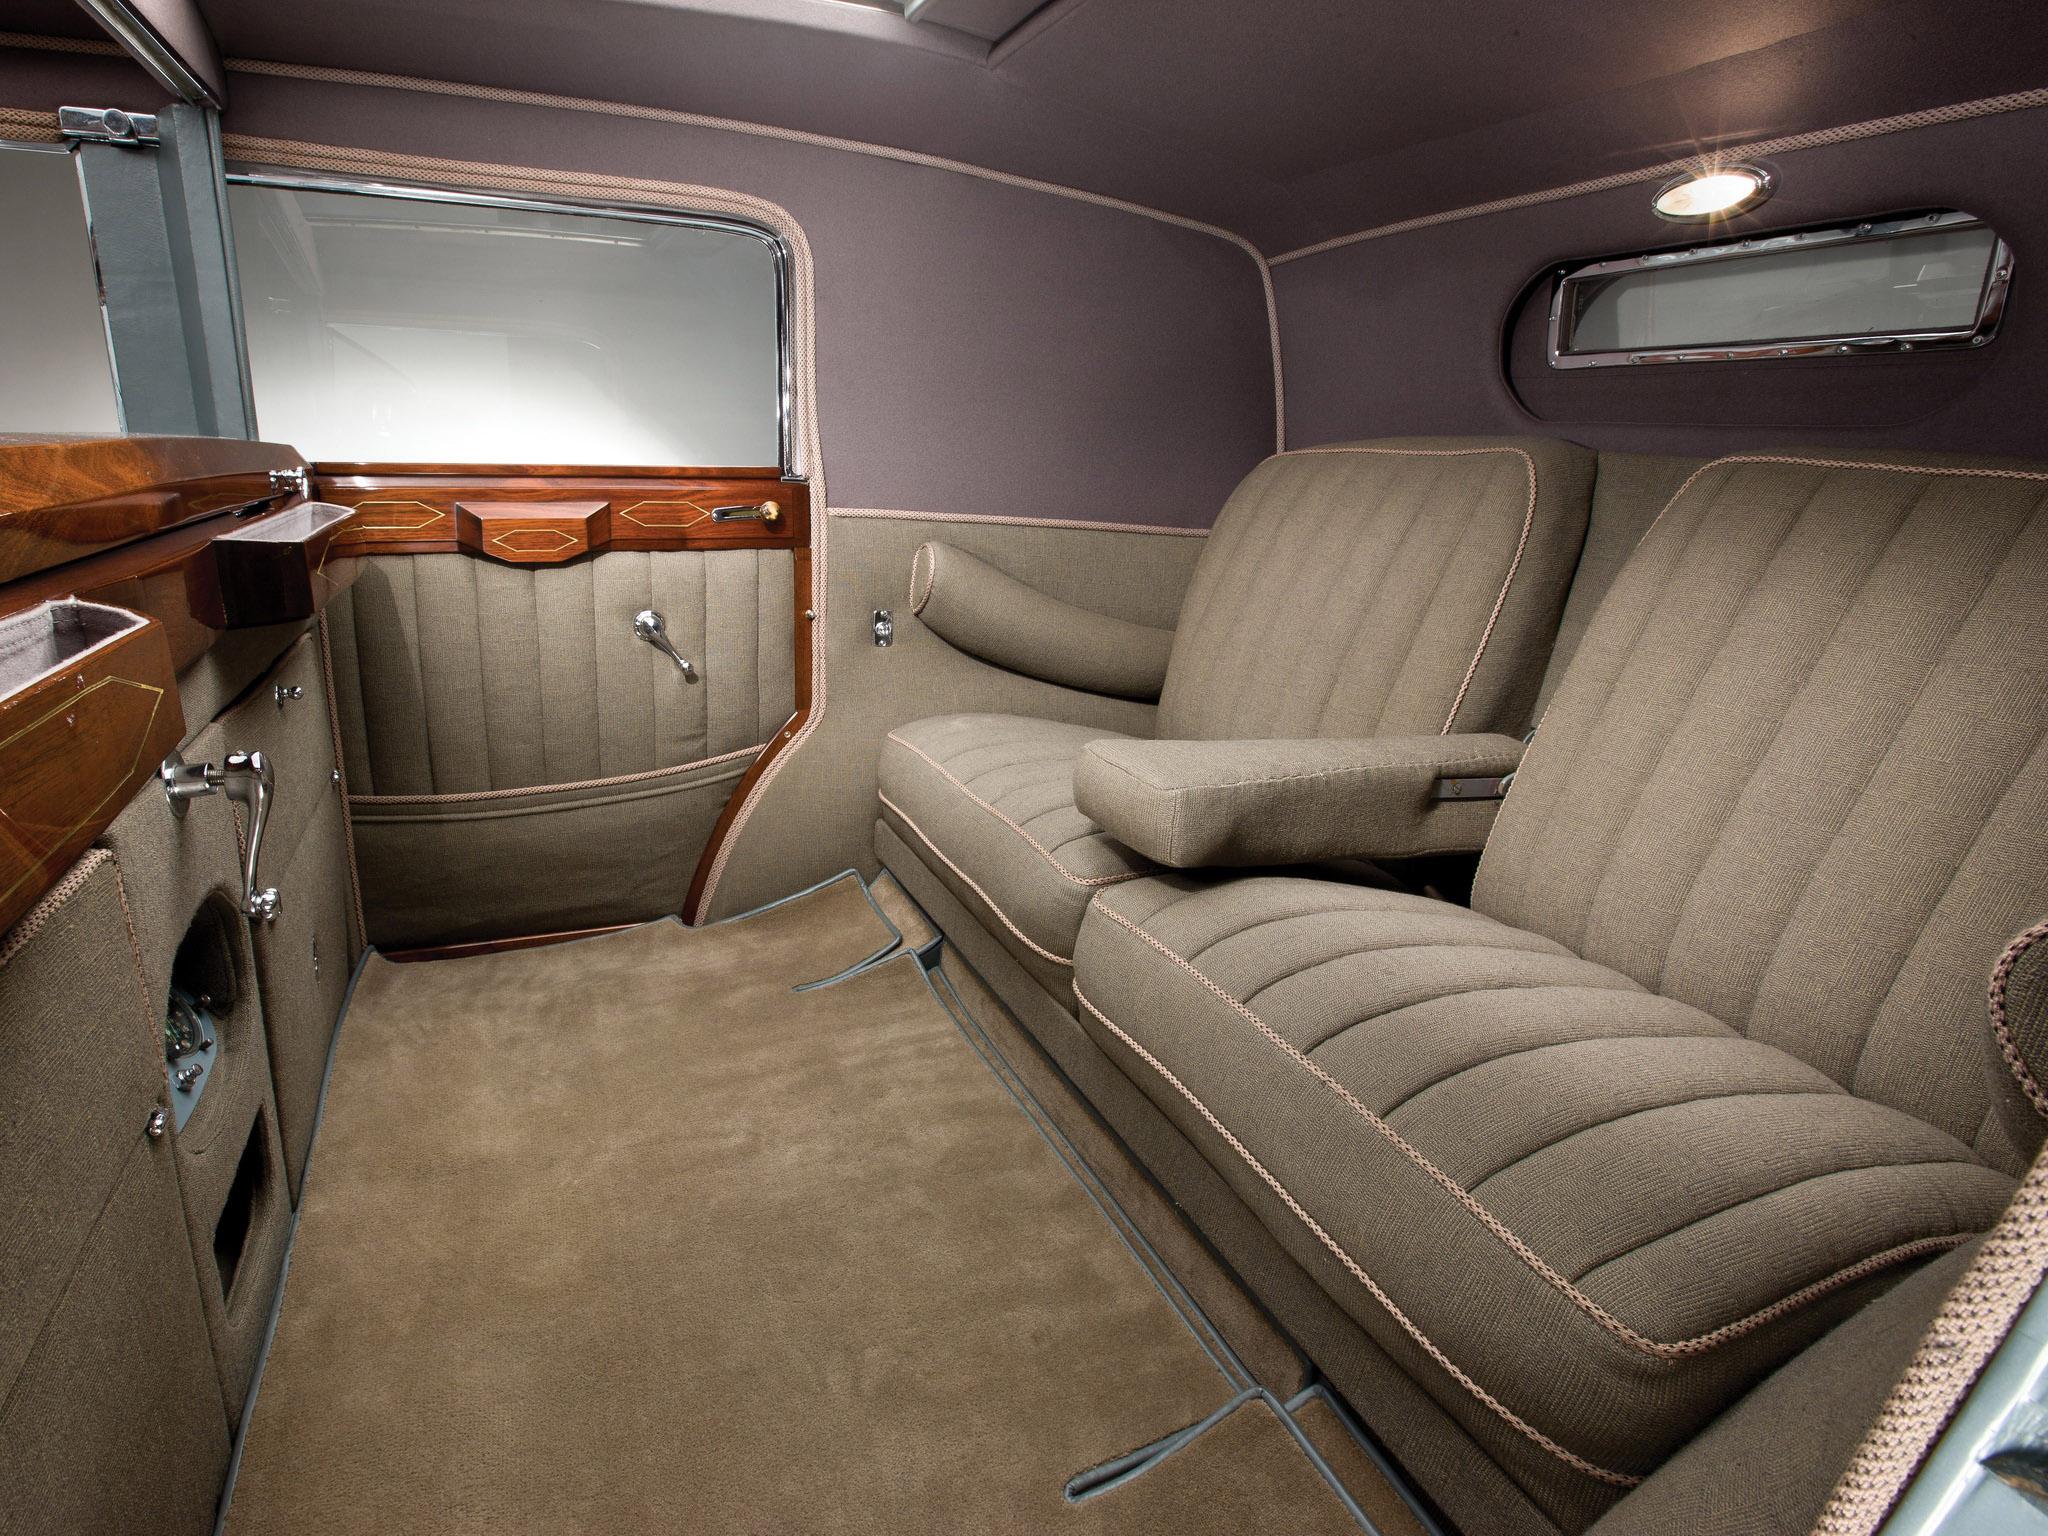 1930 cadillac sixteen v16 convertible sedan luxury retro interior g wallpaper 2048x1536. Black Bedroom Furniture Sets. Home Design Ideas